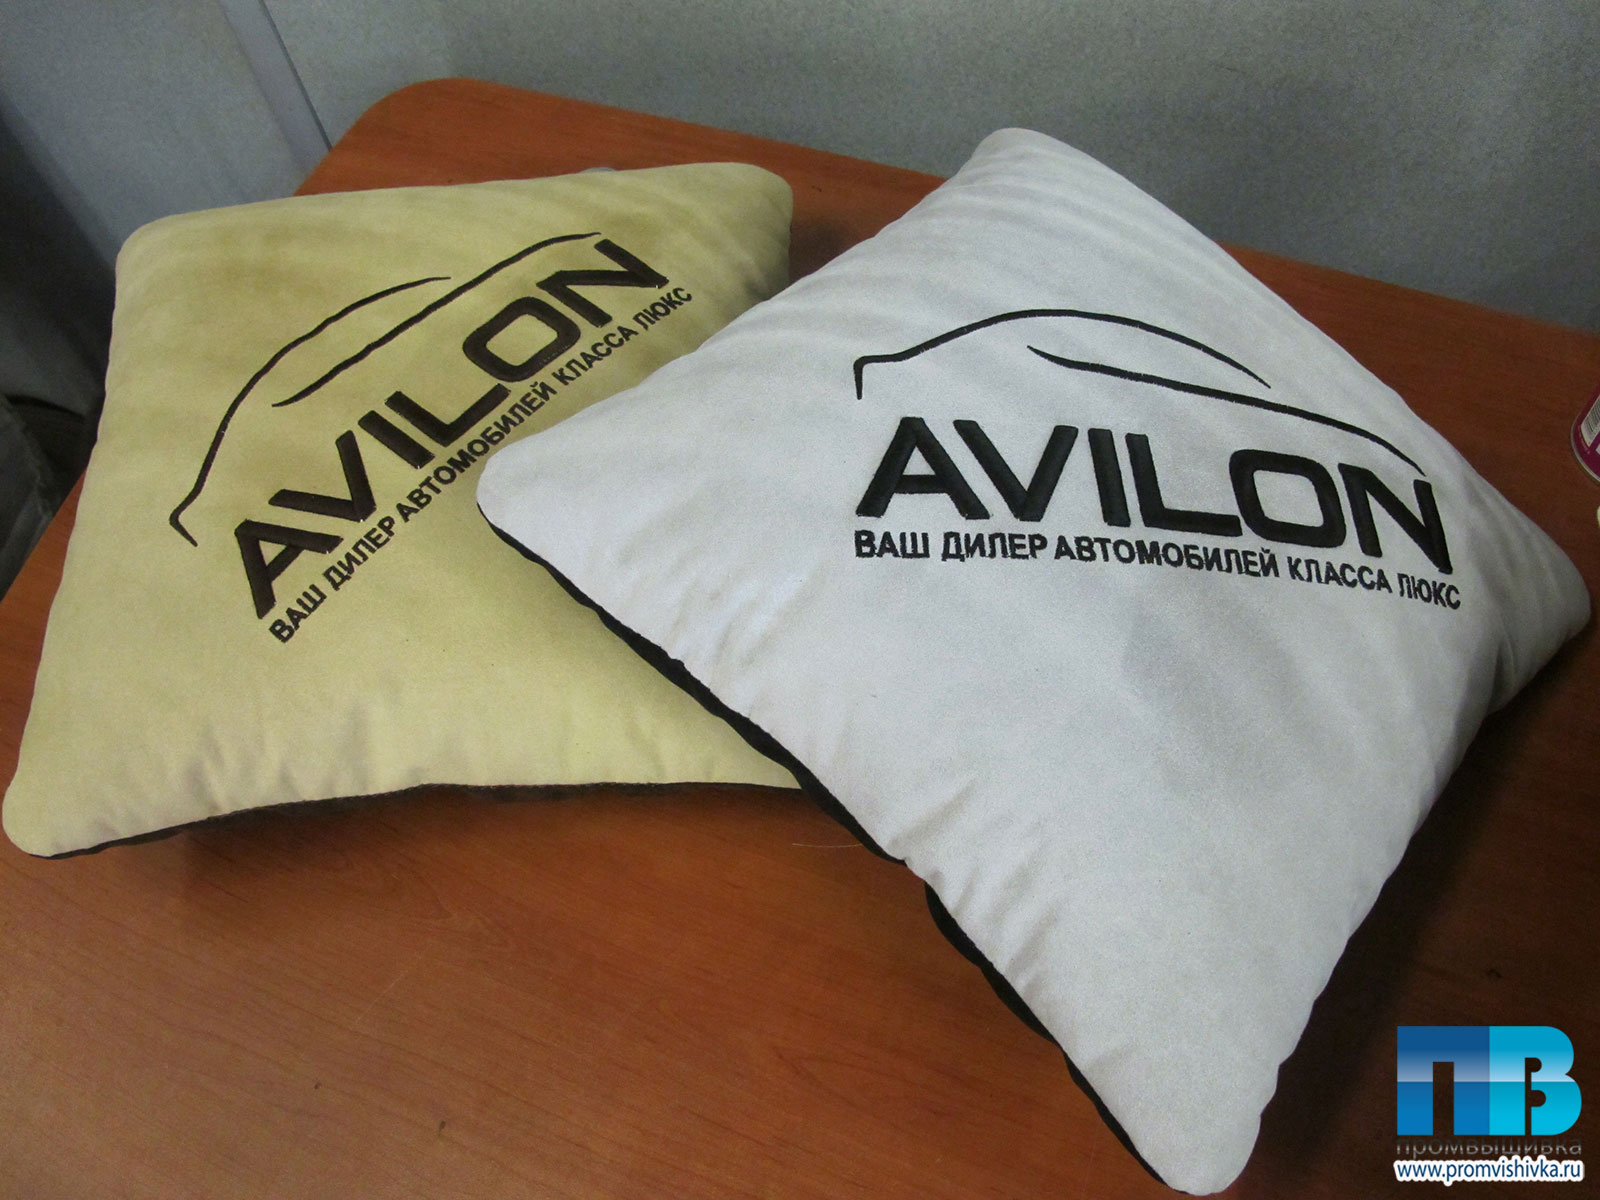 Вышивка логотипов на подушках